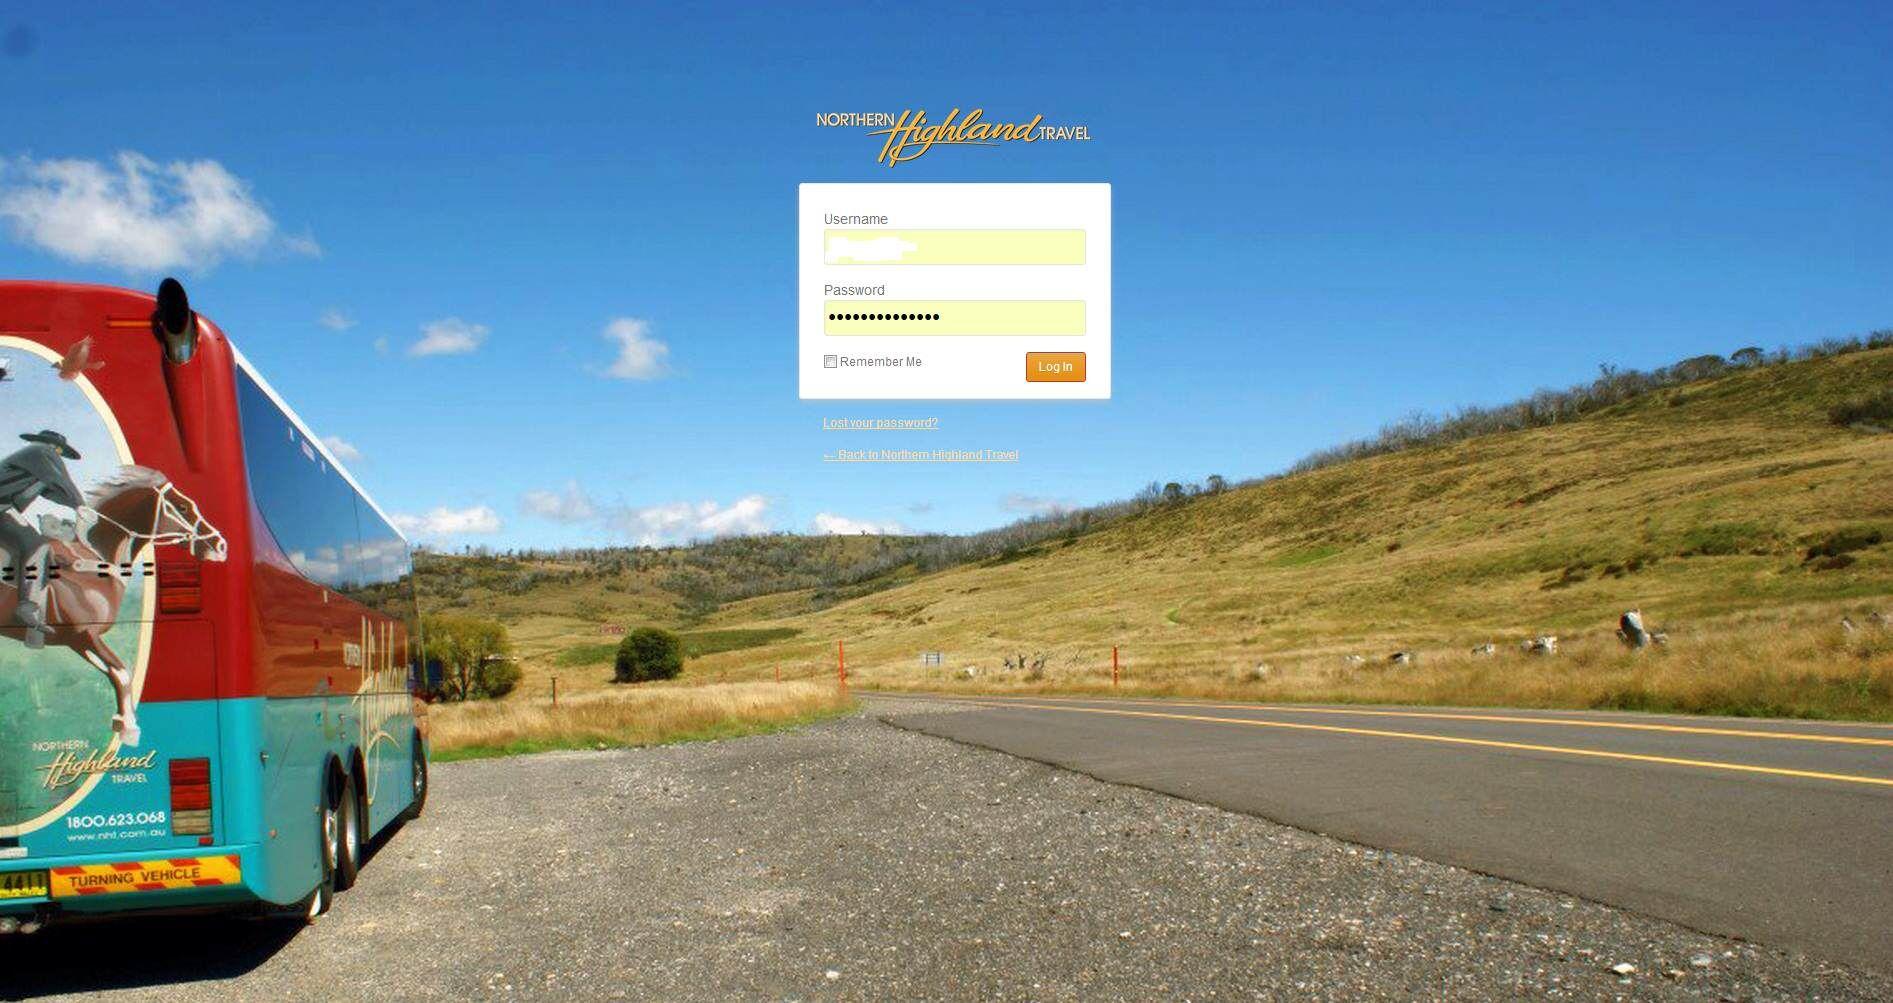 Custom Wordpress Admin Login Page With Full Page Background Image Background Images Page Background Login Page